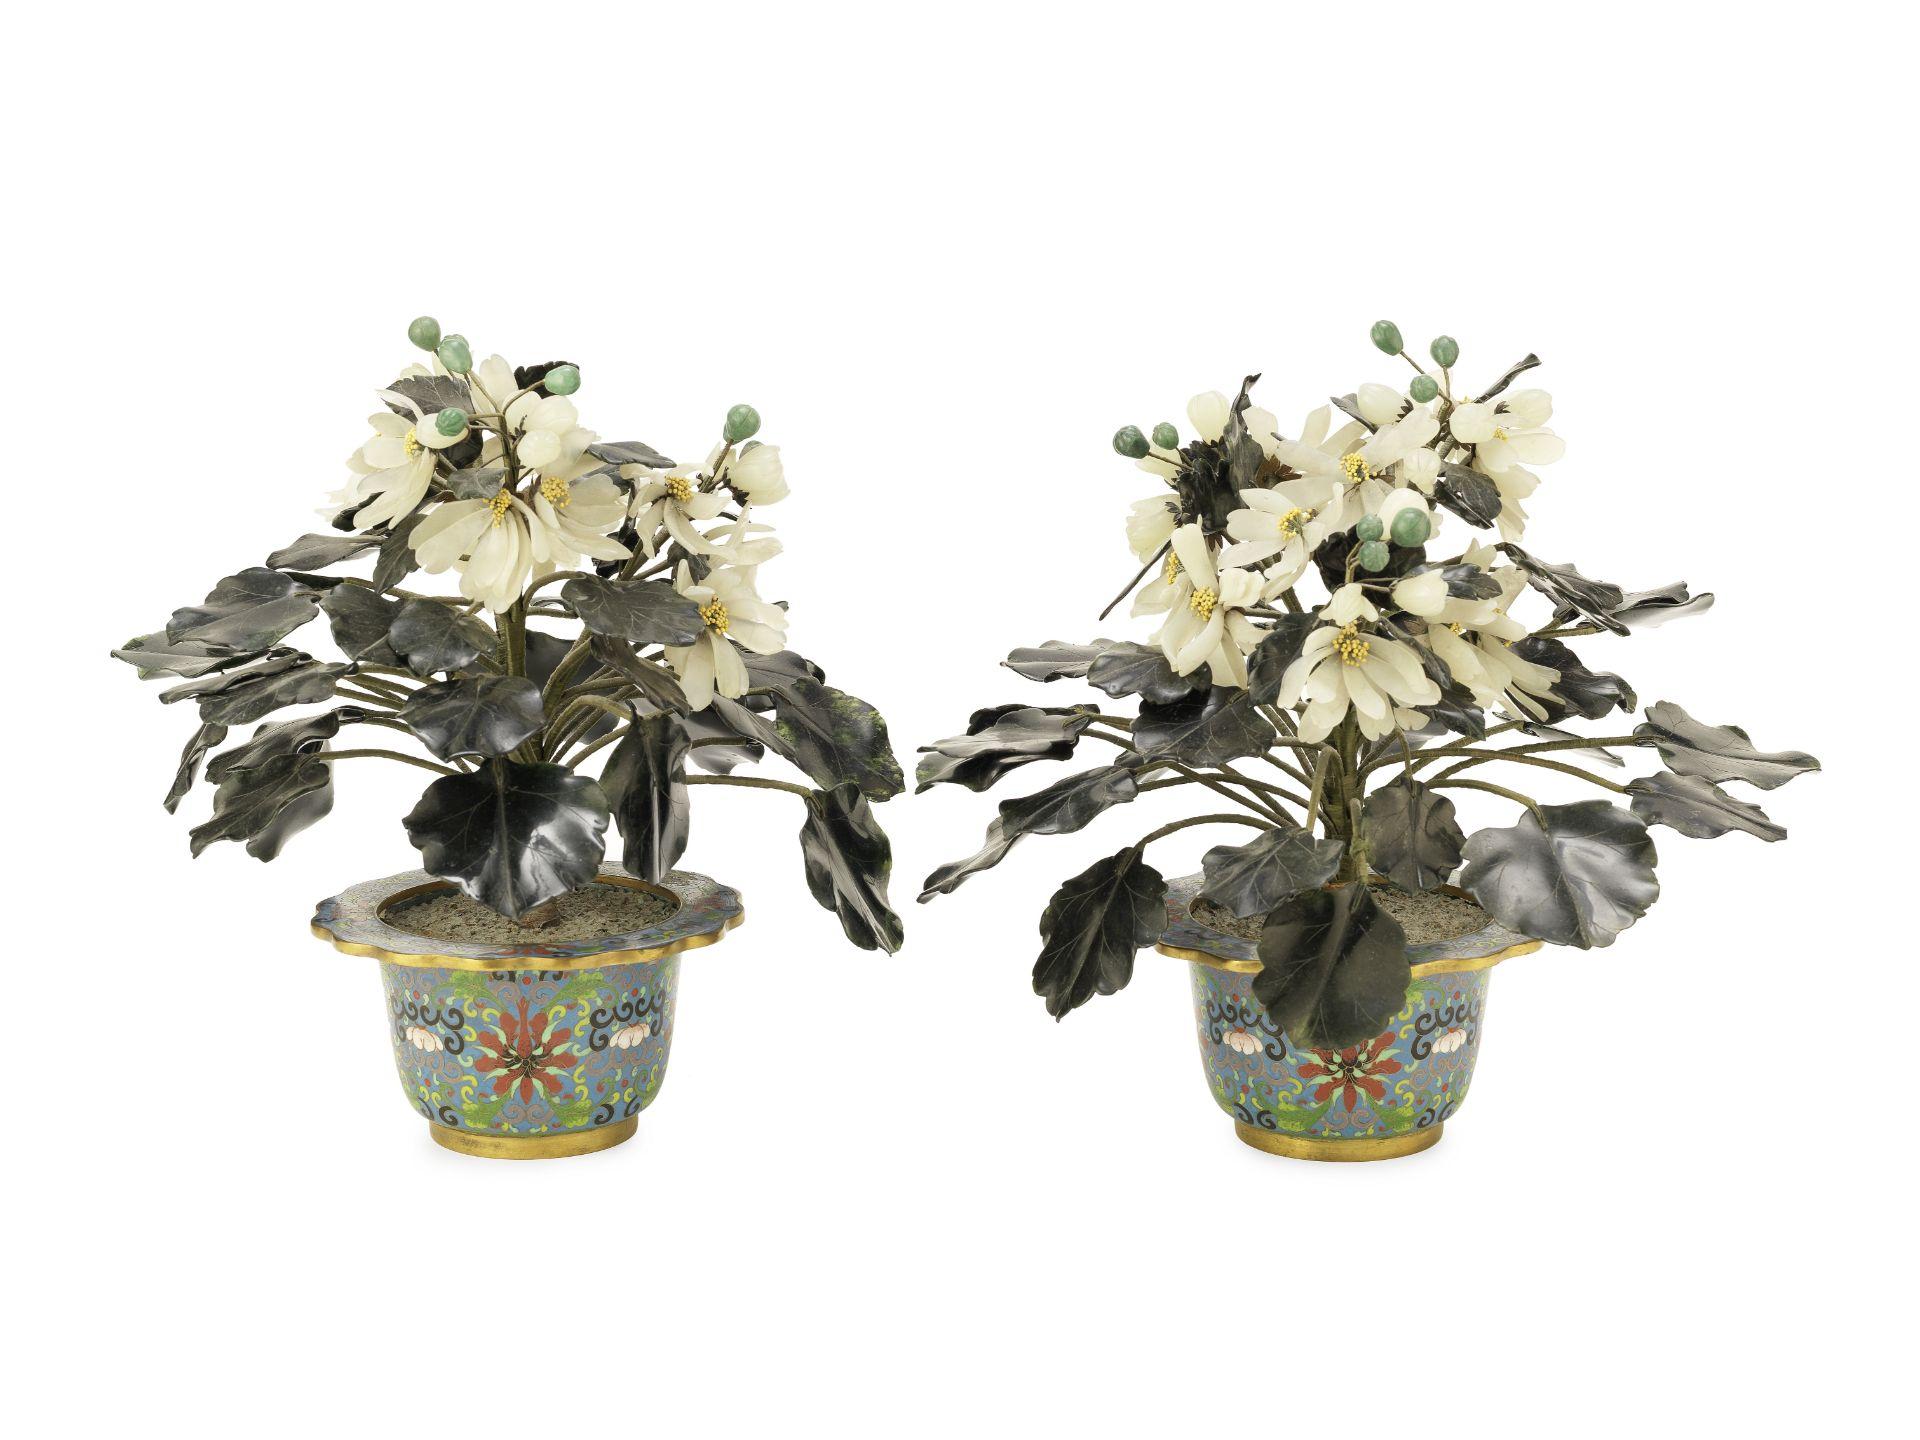 Los 223 - A pair of Chinese 'hardstone' flowering plants (2)